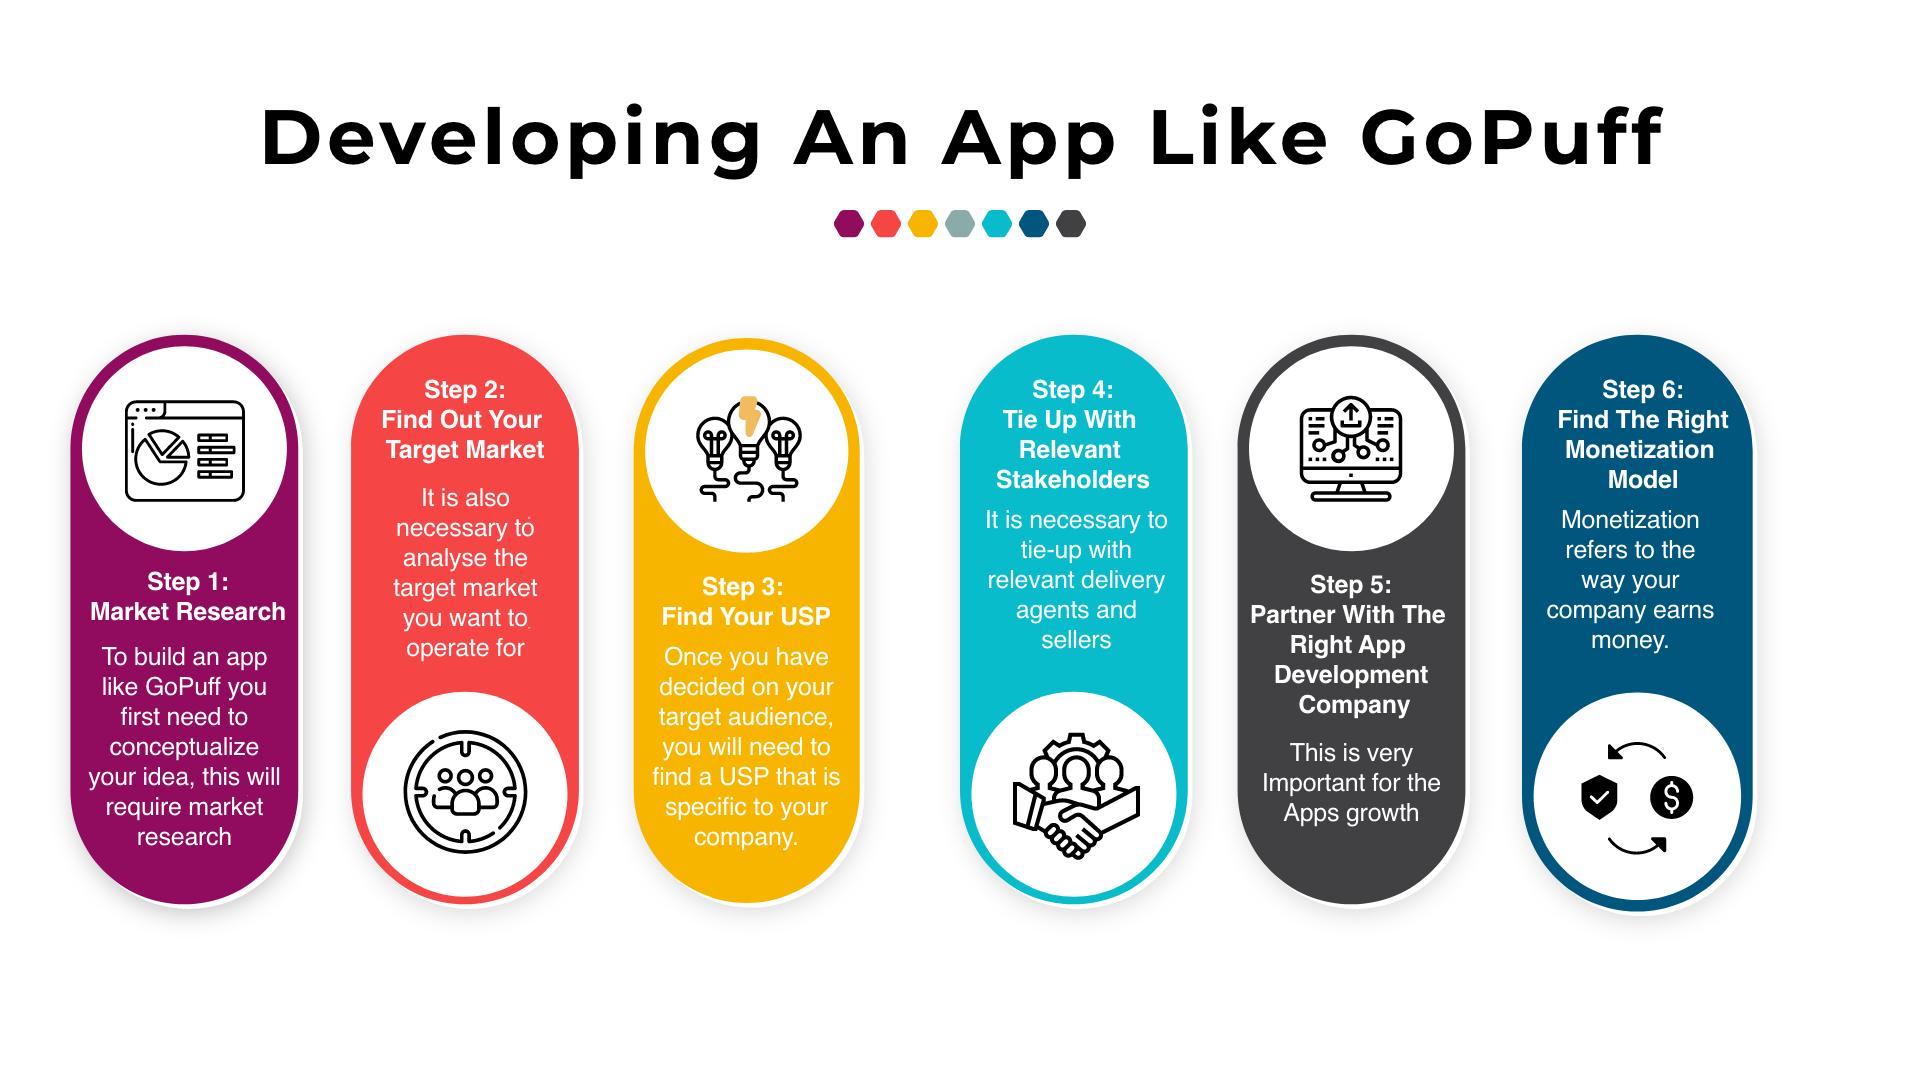 Gopuff like app development steps